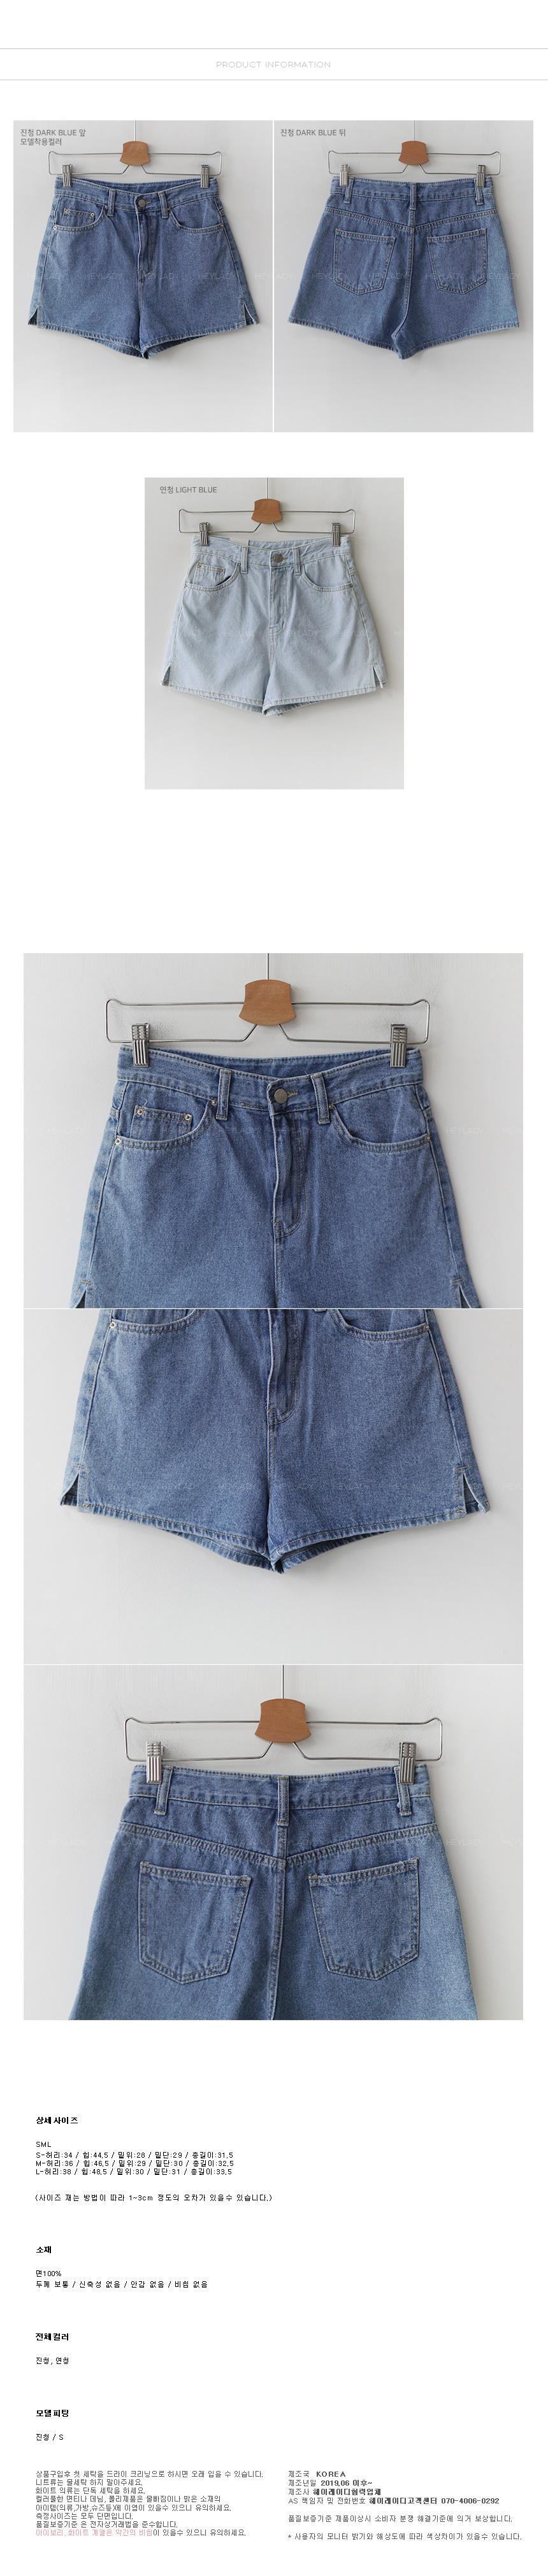 Hunter Denim Short Pants